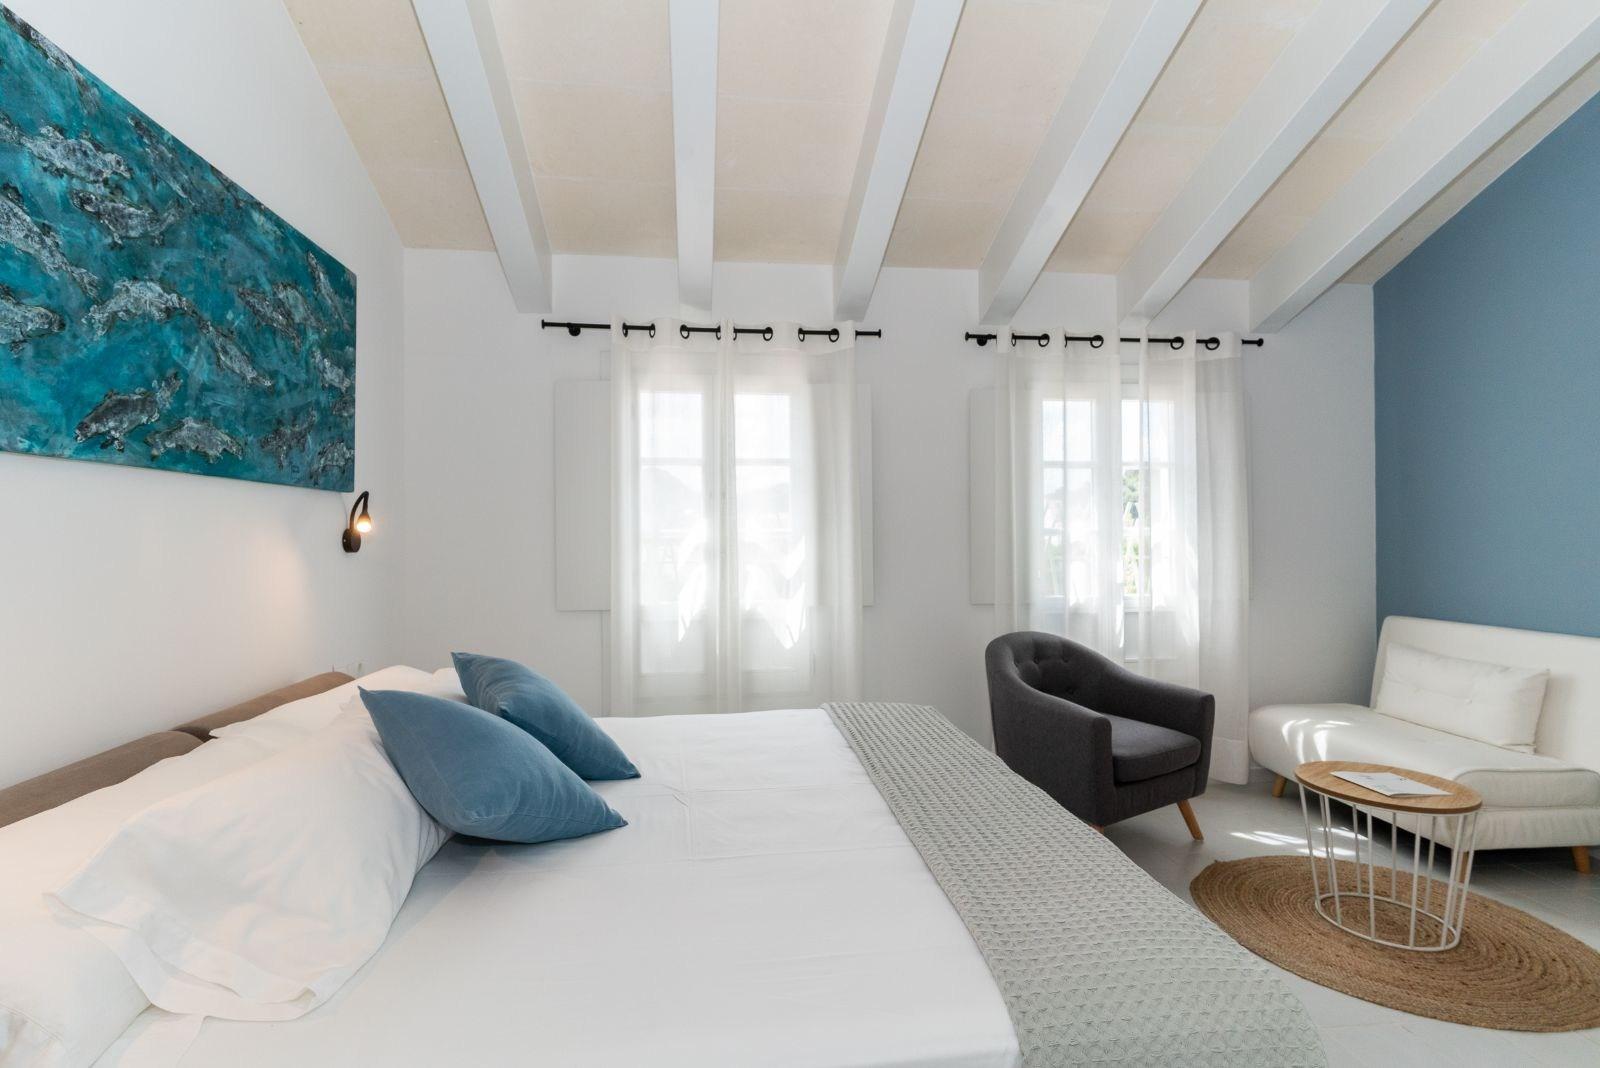 Double attic room m - 27